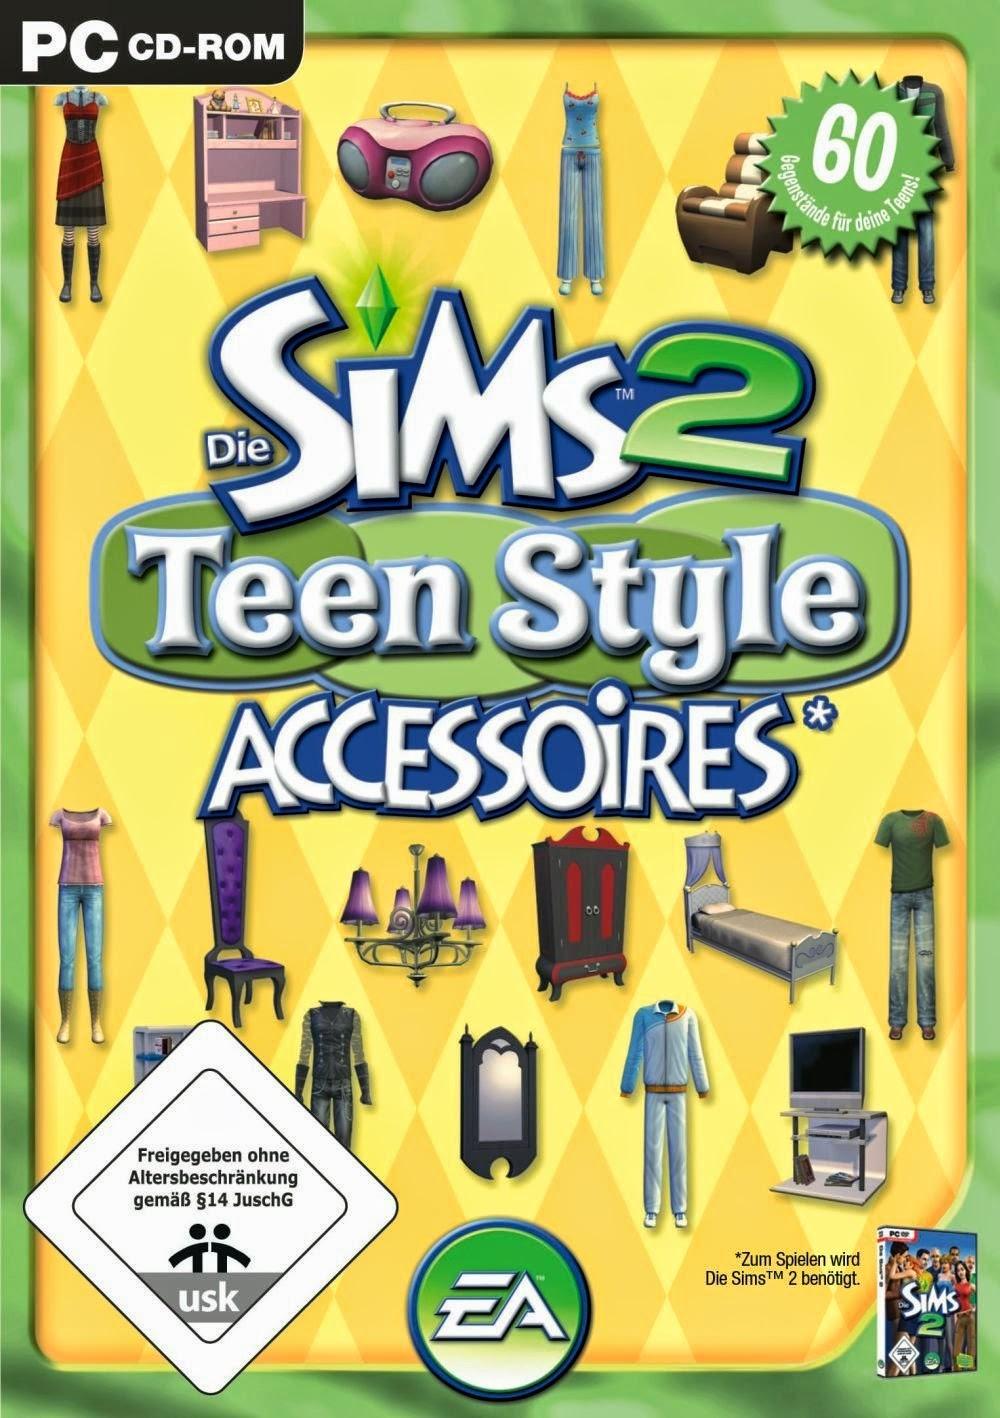 http://www.amazon.de/Die-Sims-Style-Accessoires-Add/dp/B000VMSLY4/ref=sr_1_1?ie=UTF8&s=software&qid=1271101676&sr=8-1-catcorr